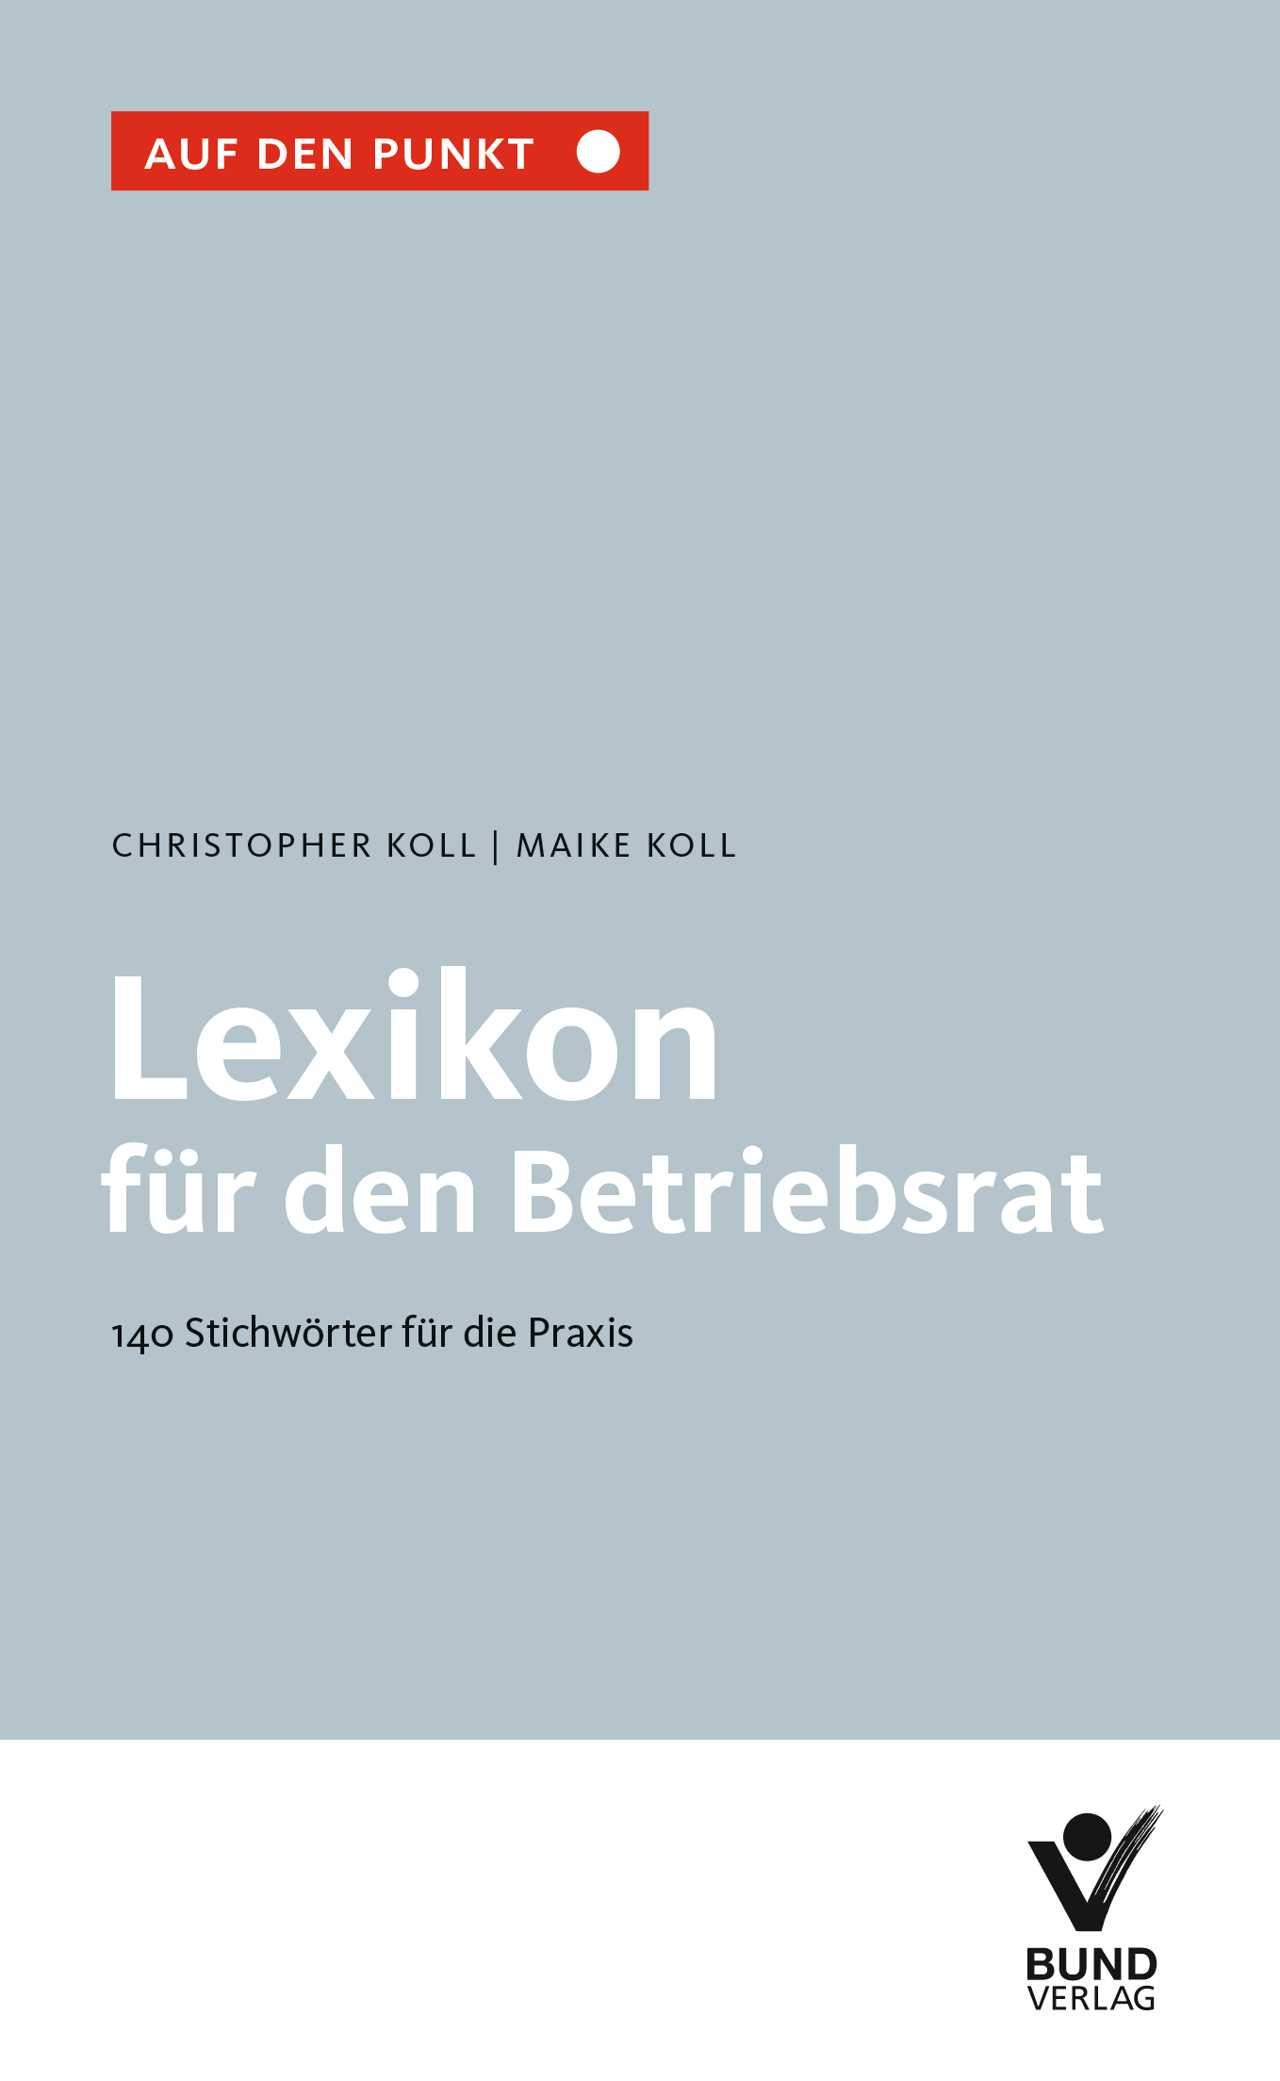 Lexikon für den Betriebsrat - Christopher und Maike Koll